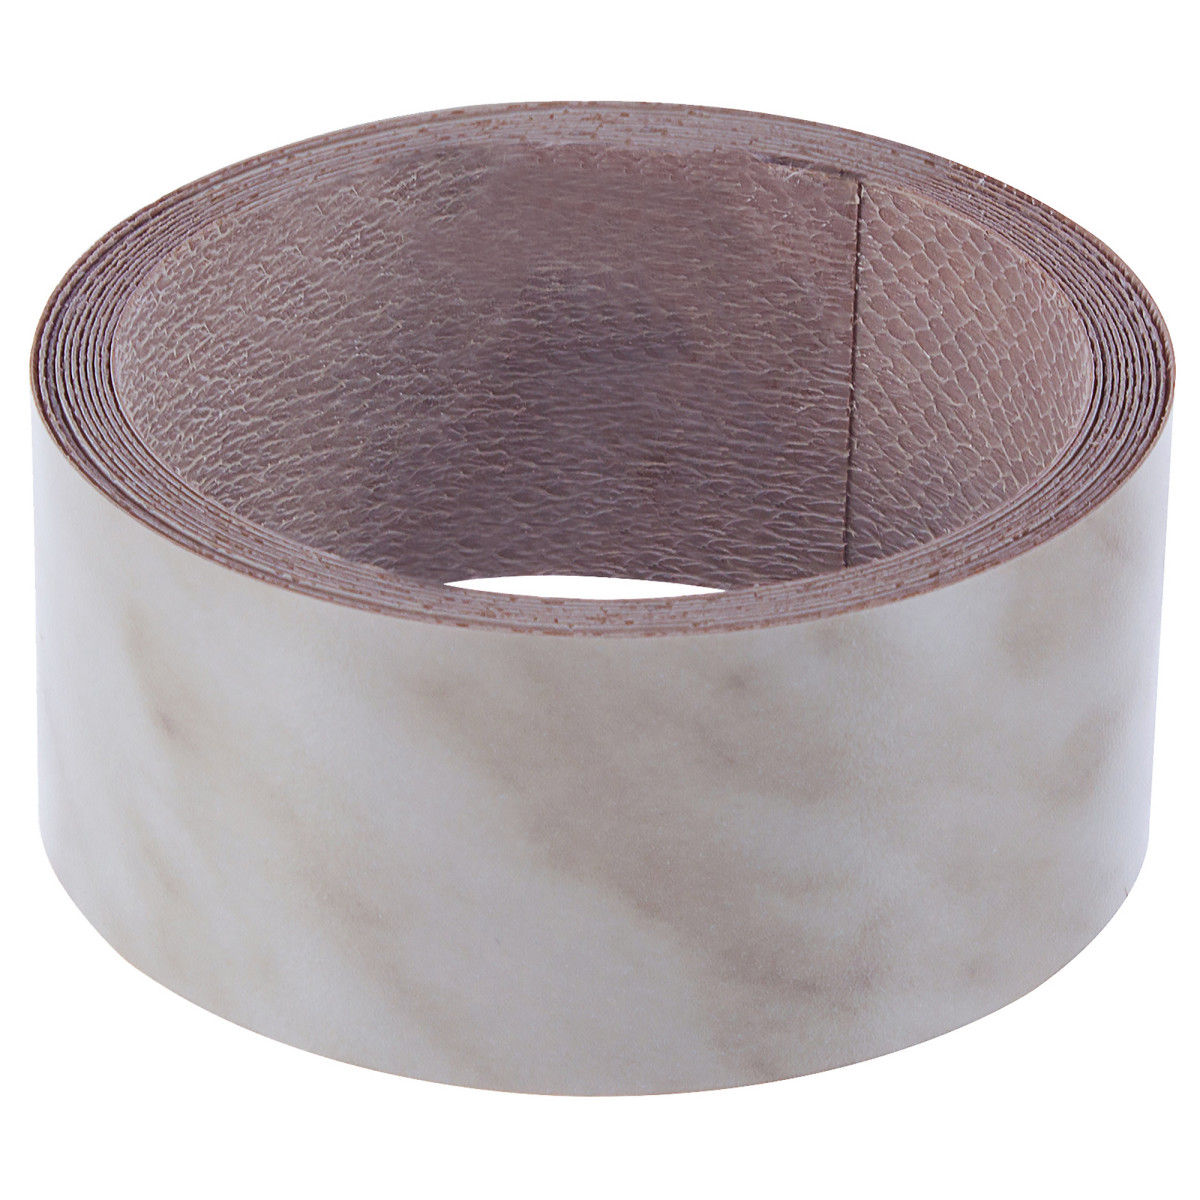 Кромка №3014 с клеем для столешницы 300х4.2 см цвет мрамор каррара